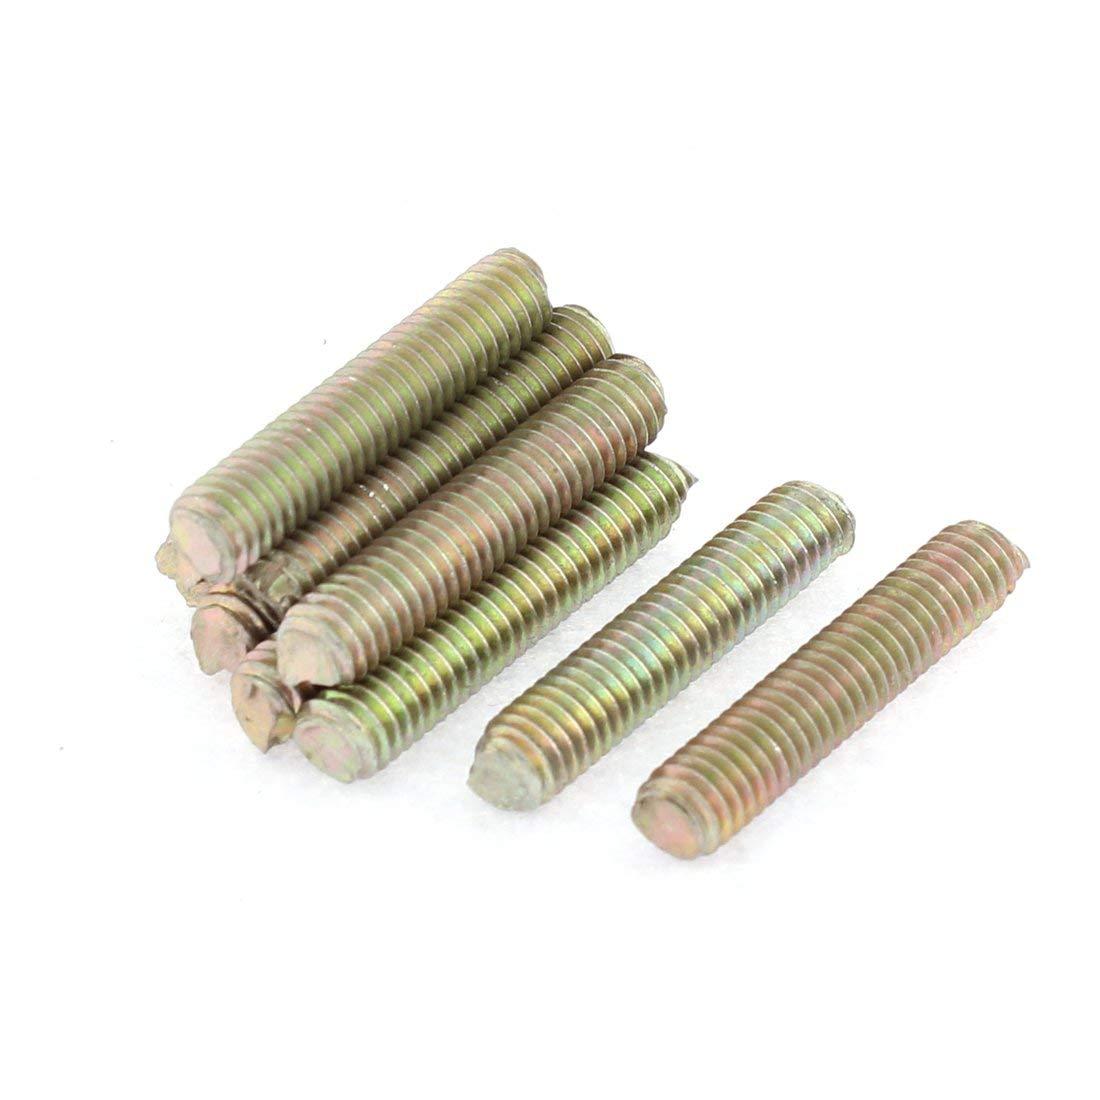 6mm X 1   Threaded Rod  B7 1 pc 1000mm long high tensile steel